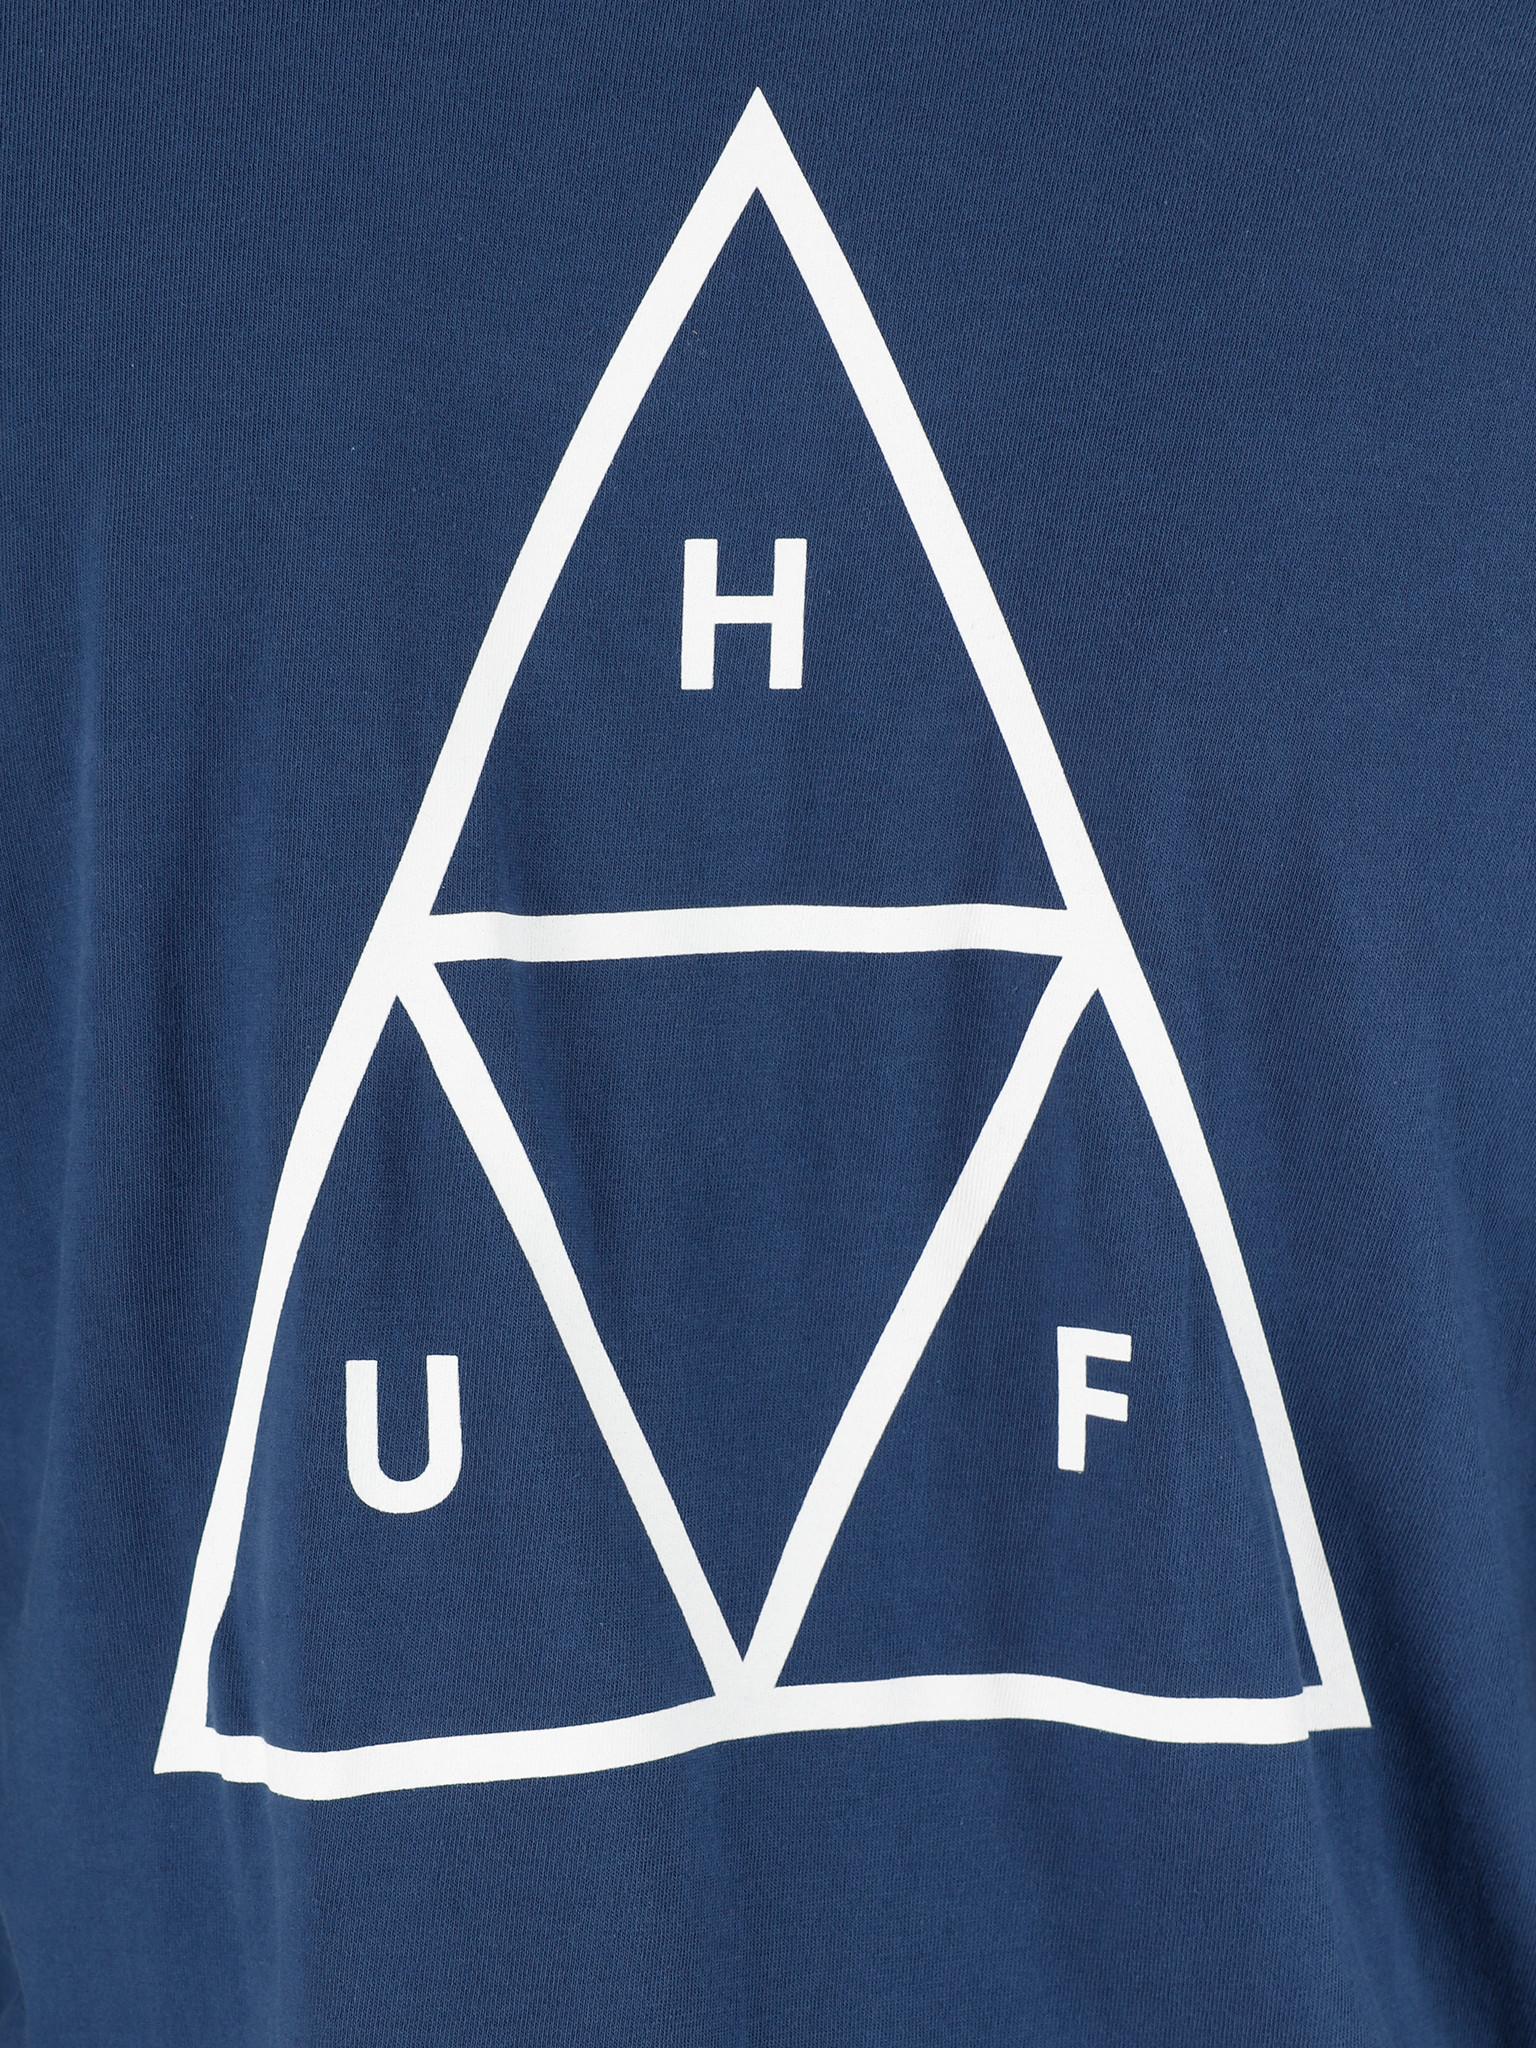 HUF HUF Essentials Tt Longsleeve Tee Insignia Blue Ts00506Iablu